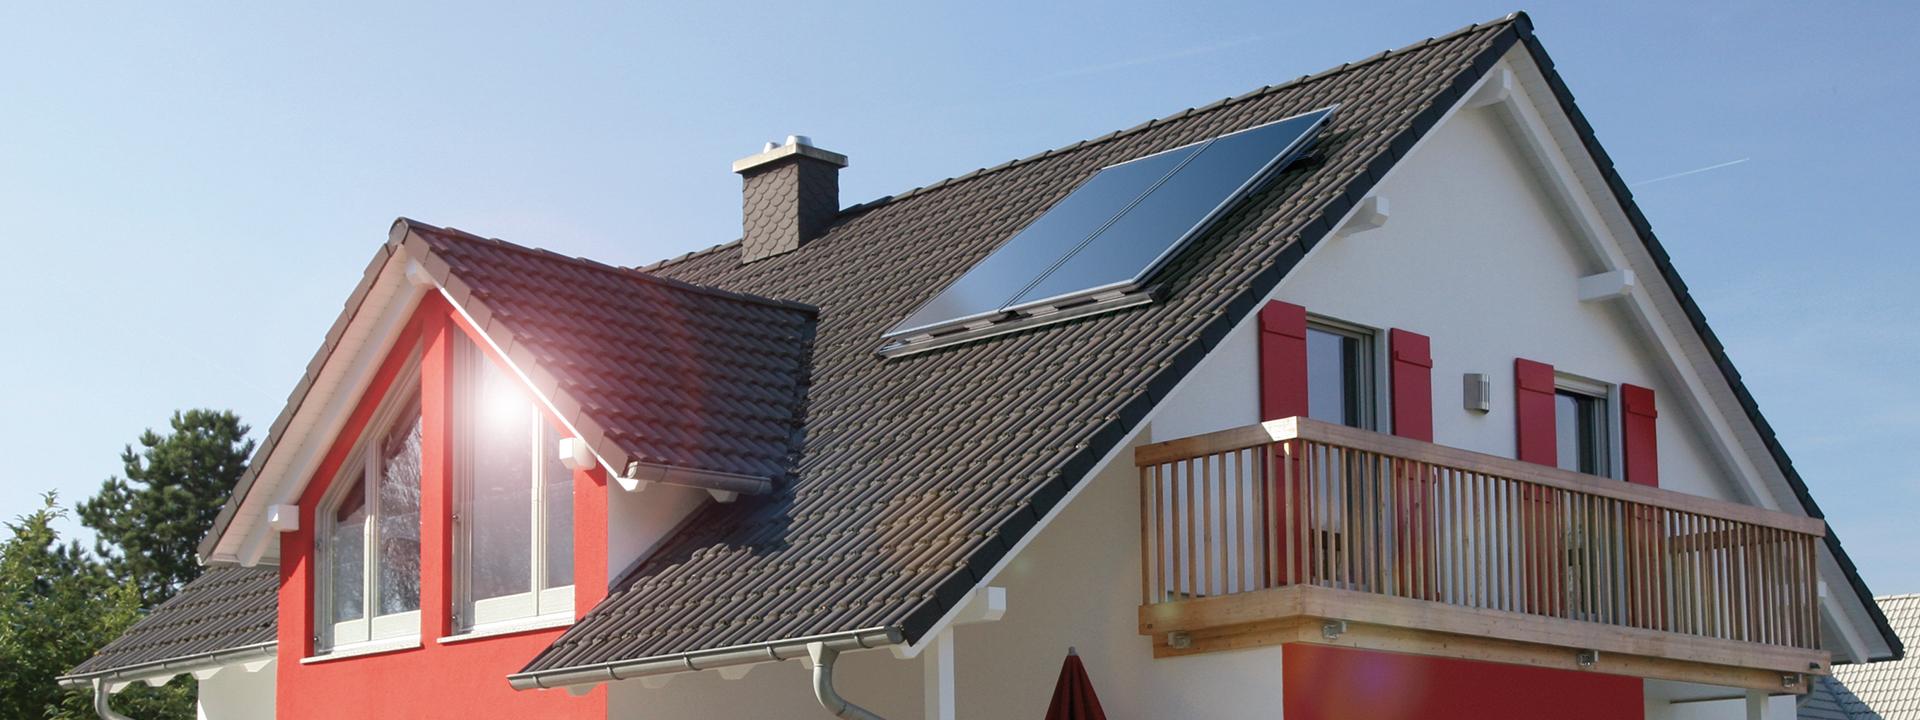 Hausdach mit Solar